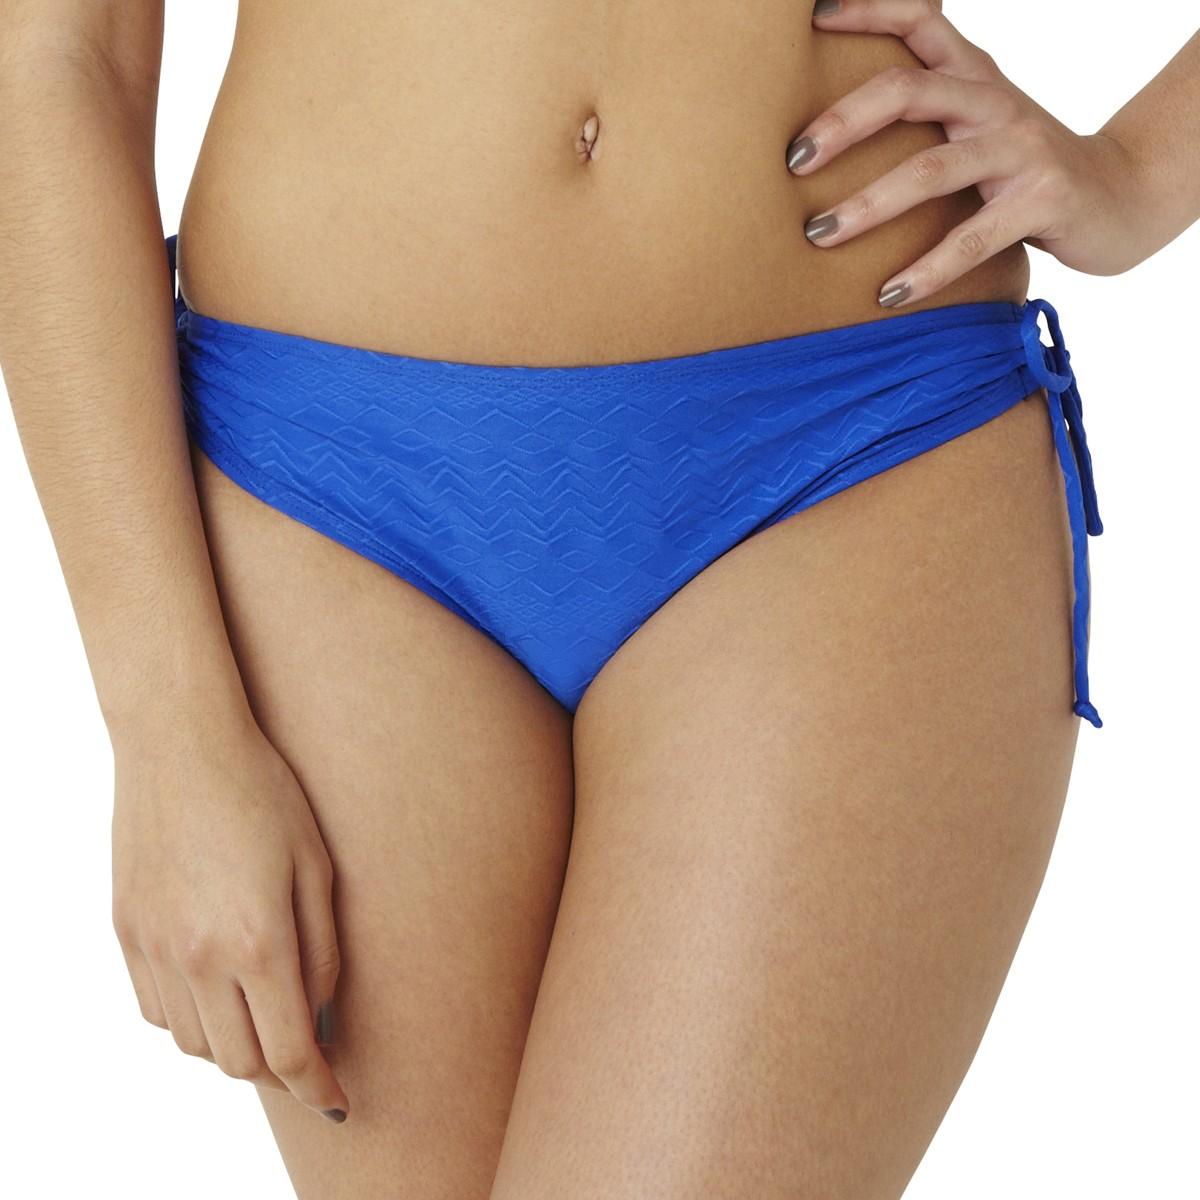 Panache Cleo Matilda Drawstring Bikini Brief - Cobalt